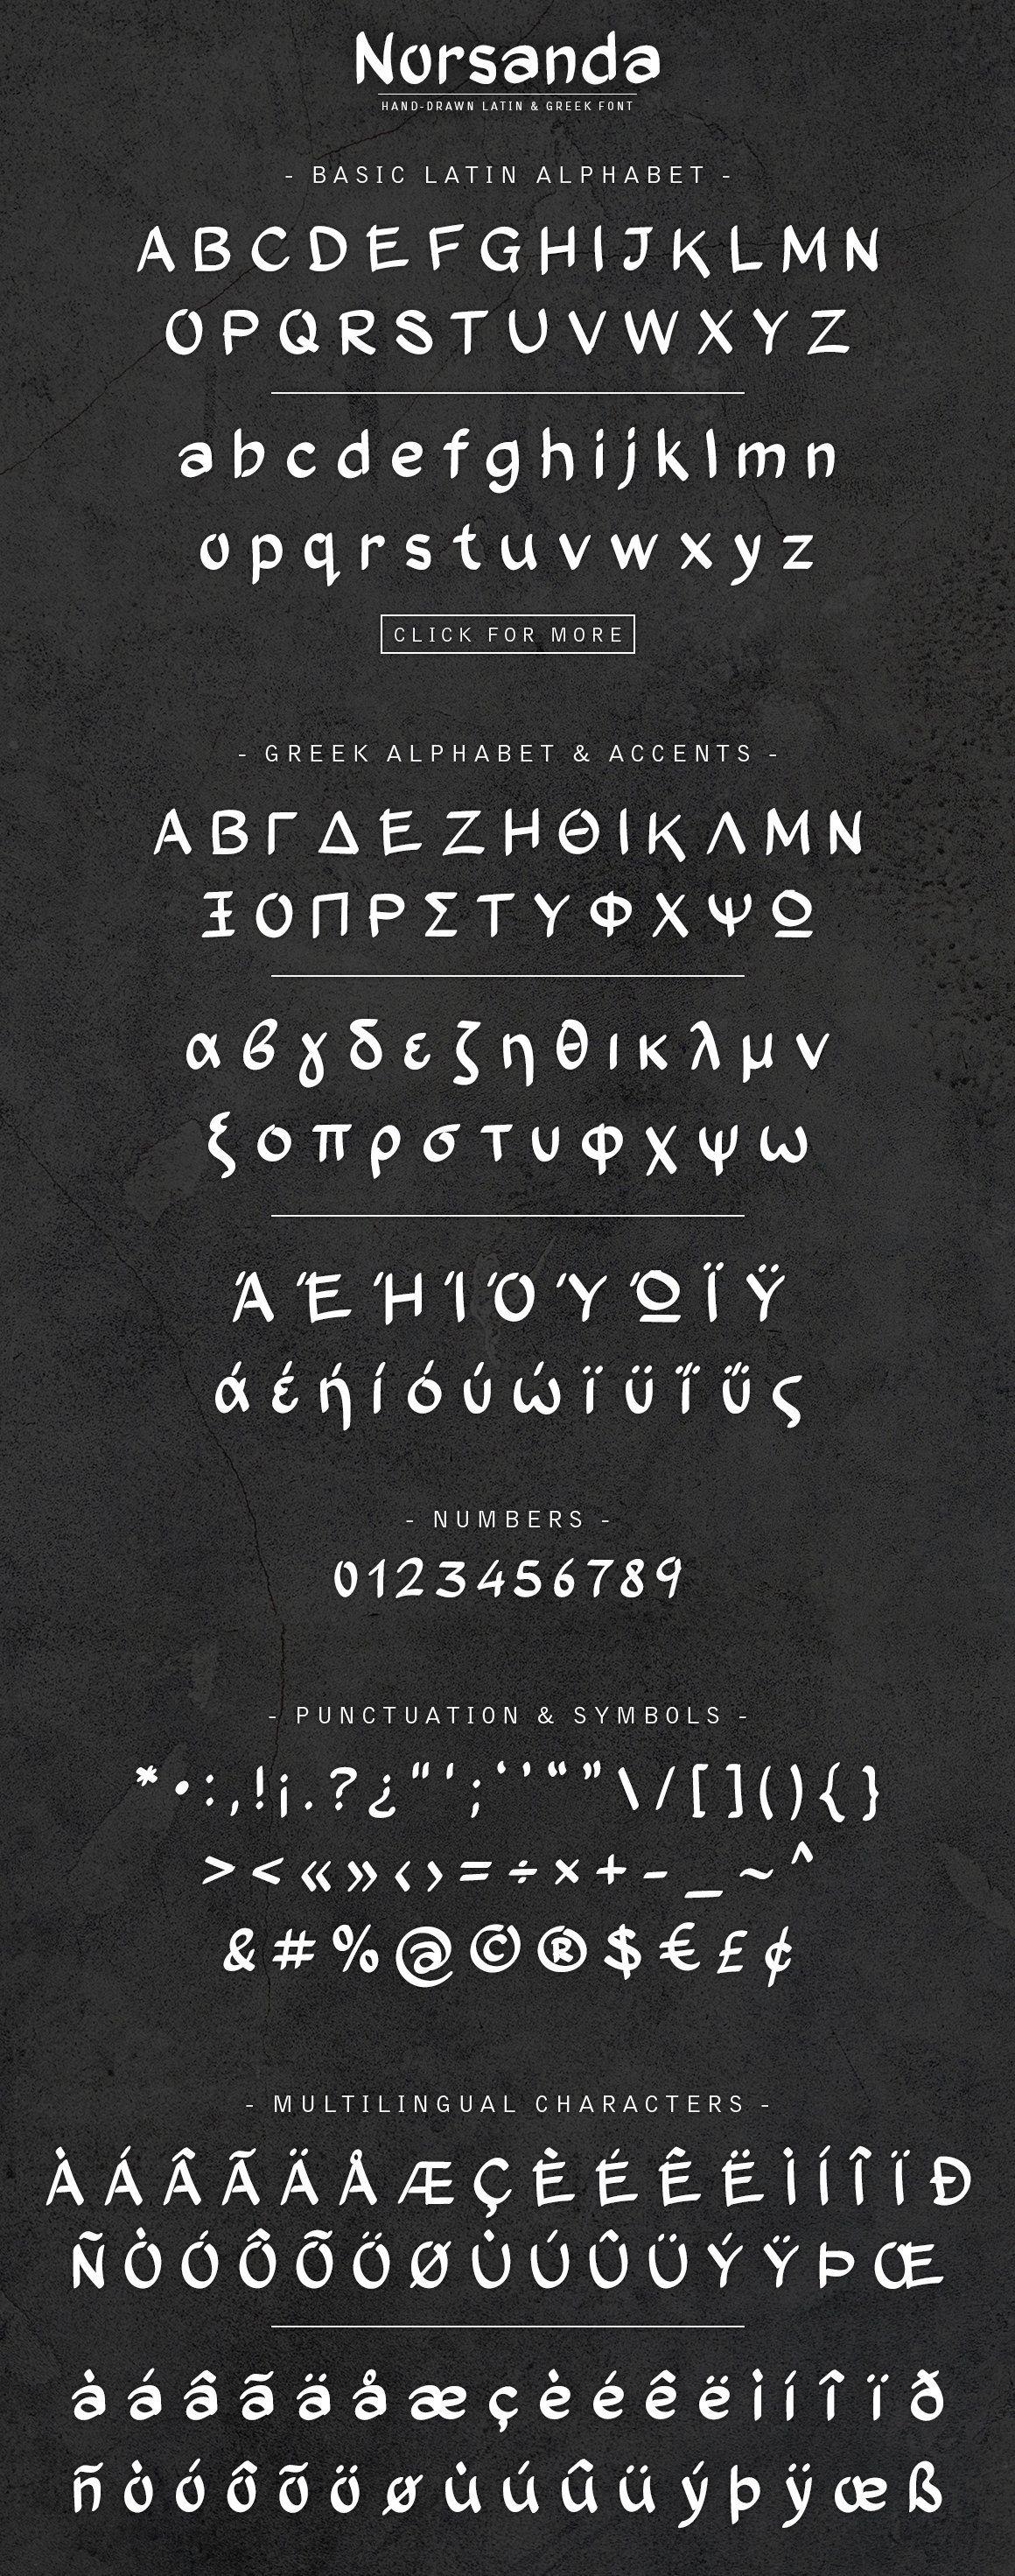 Norsanda Handdrawn Font , Affiliate, CatalanPortuguese